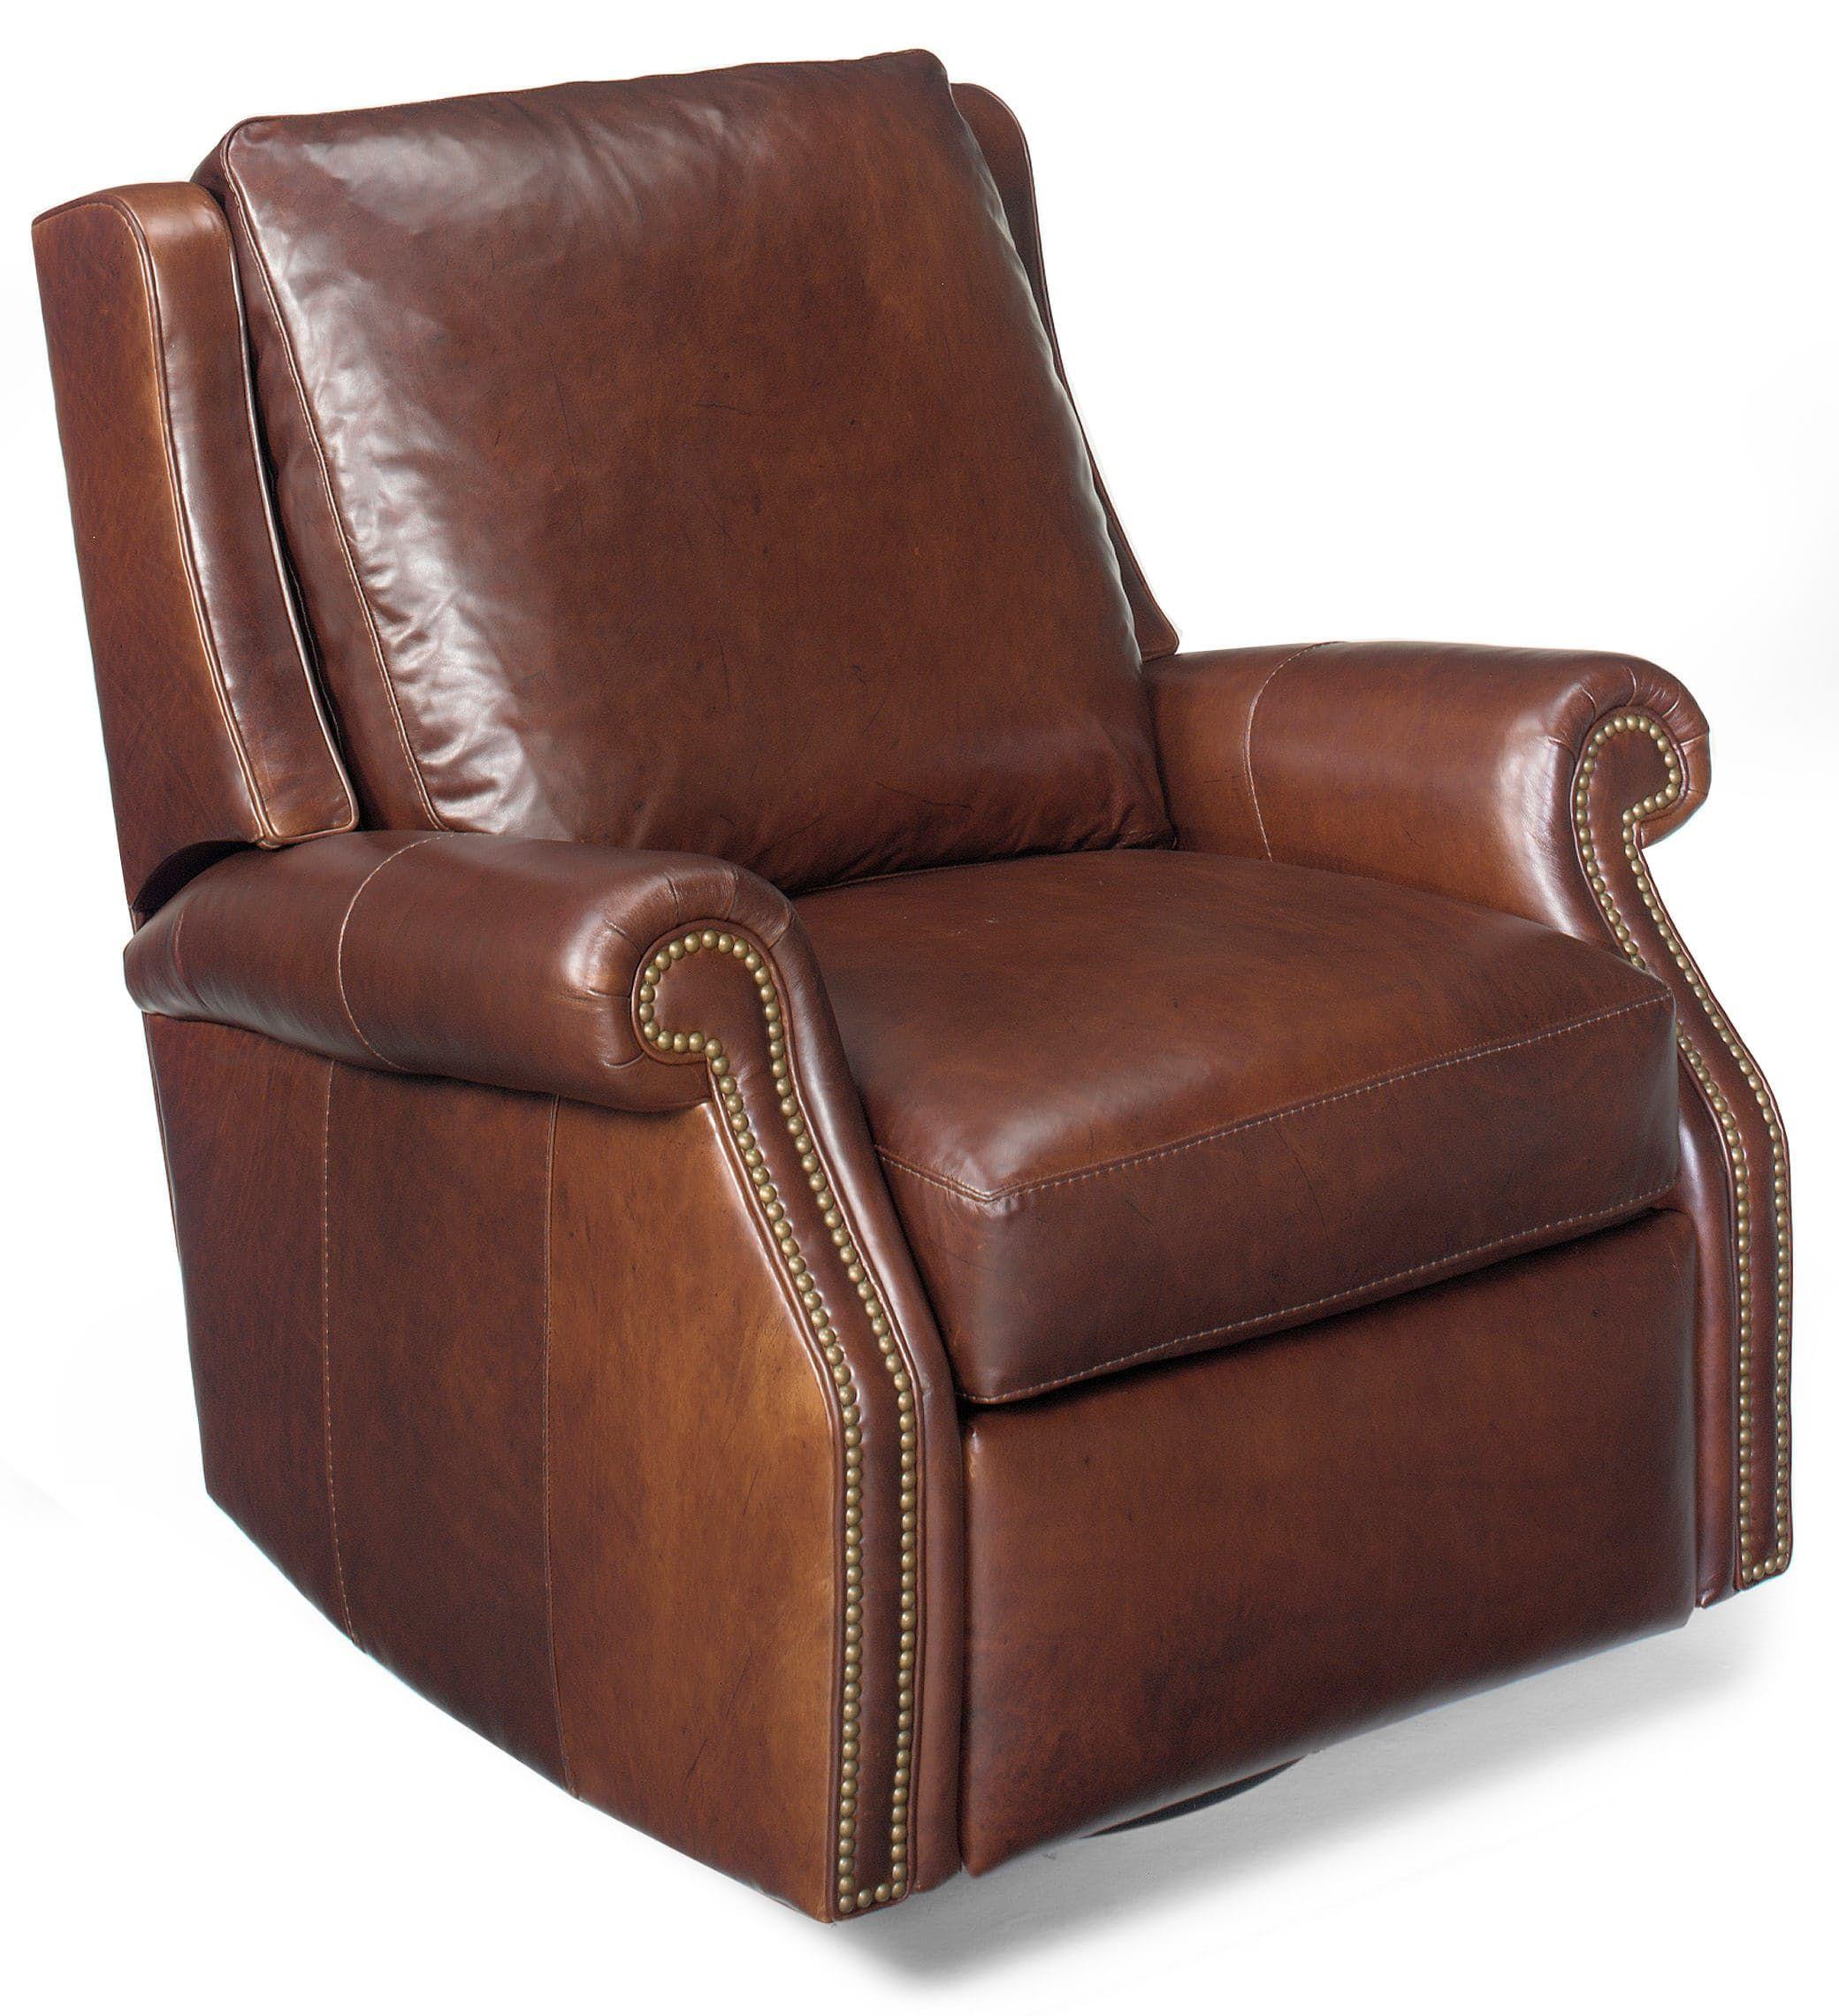 Fantastic Bradington Young Barcelo Wall Hugger Recliner 7411 Uwap Interior Chair Design Uwaporg